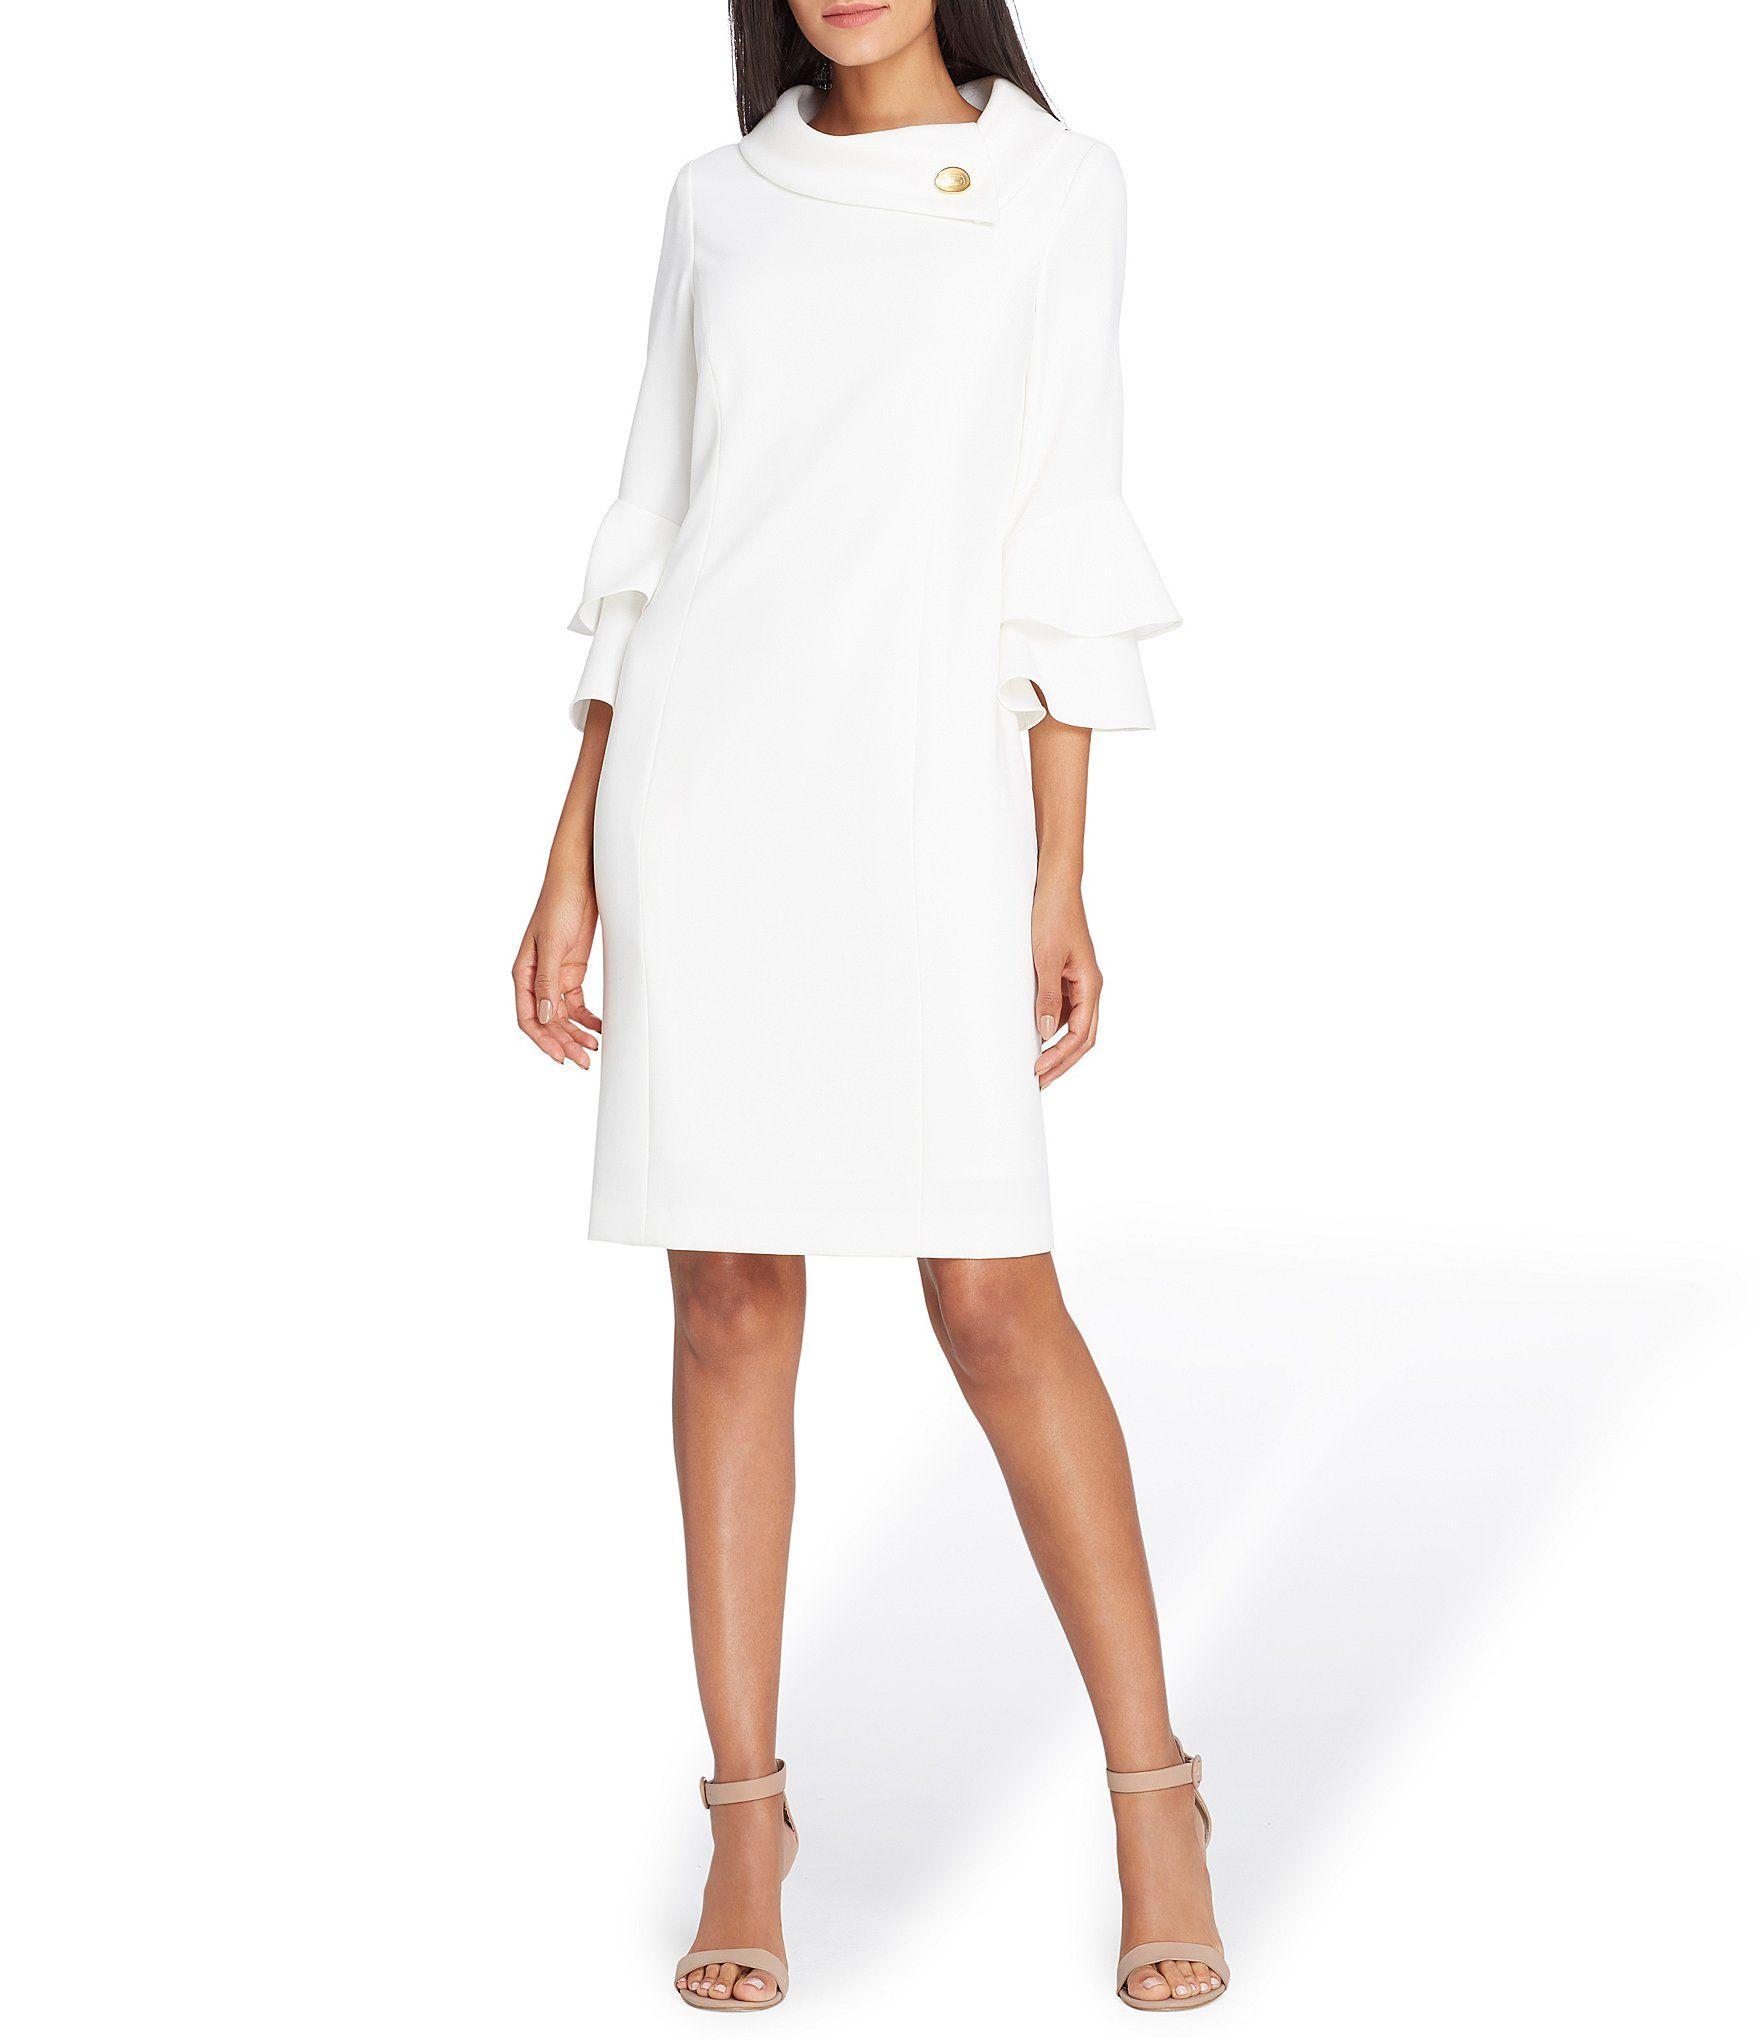 c93387c4b18 Shop for Tahari ASL Broach Shawl Collar Ruffle Sleeve Dress at Dillards.com.  Visit Dillards.com to find clothing